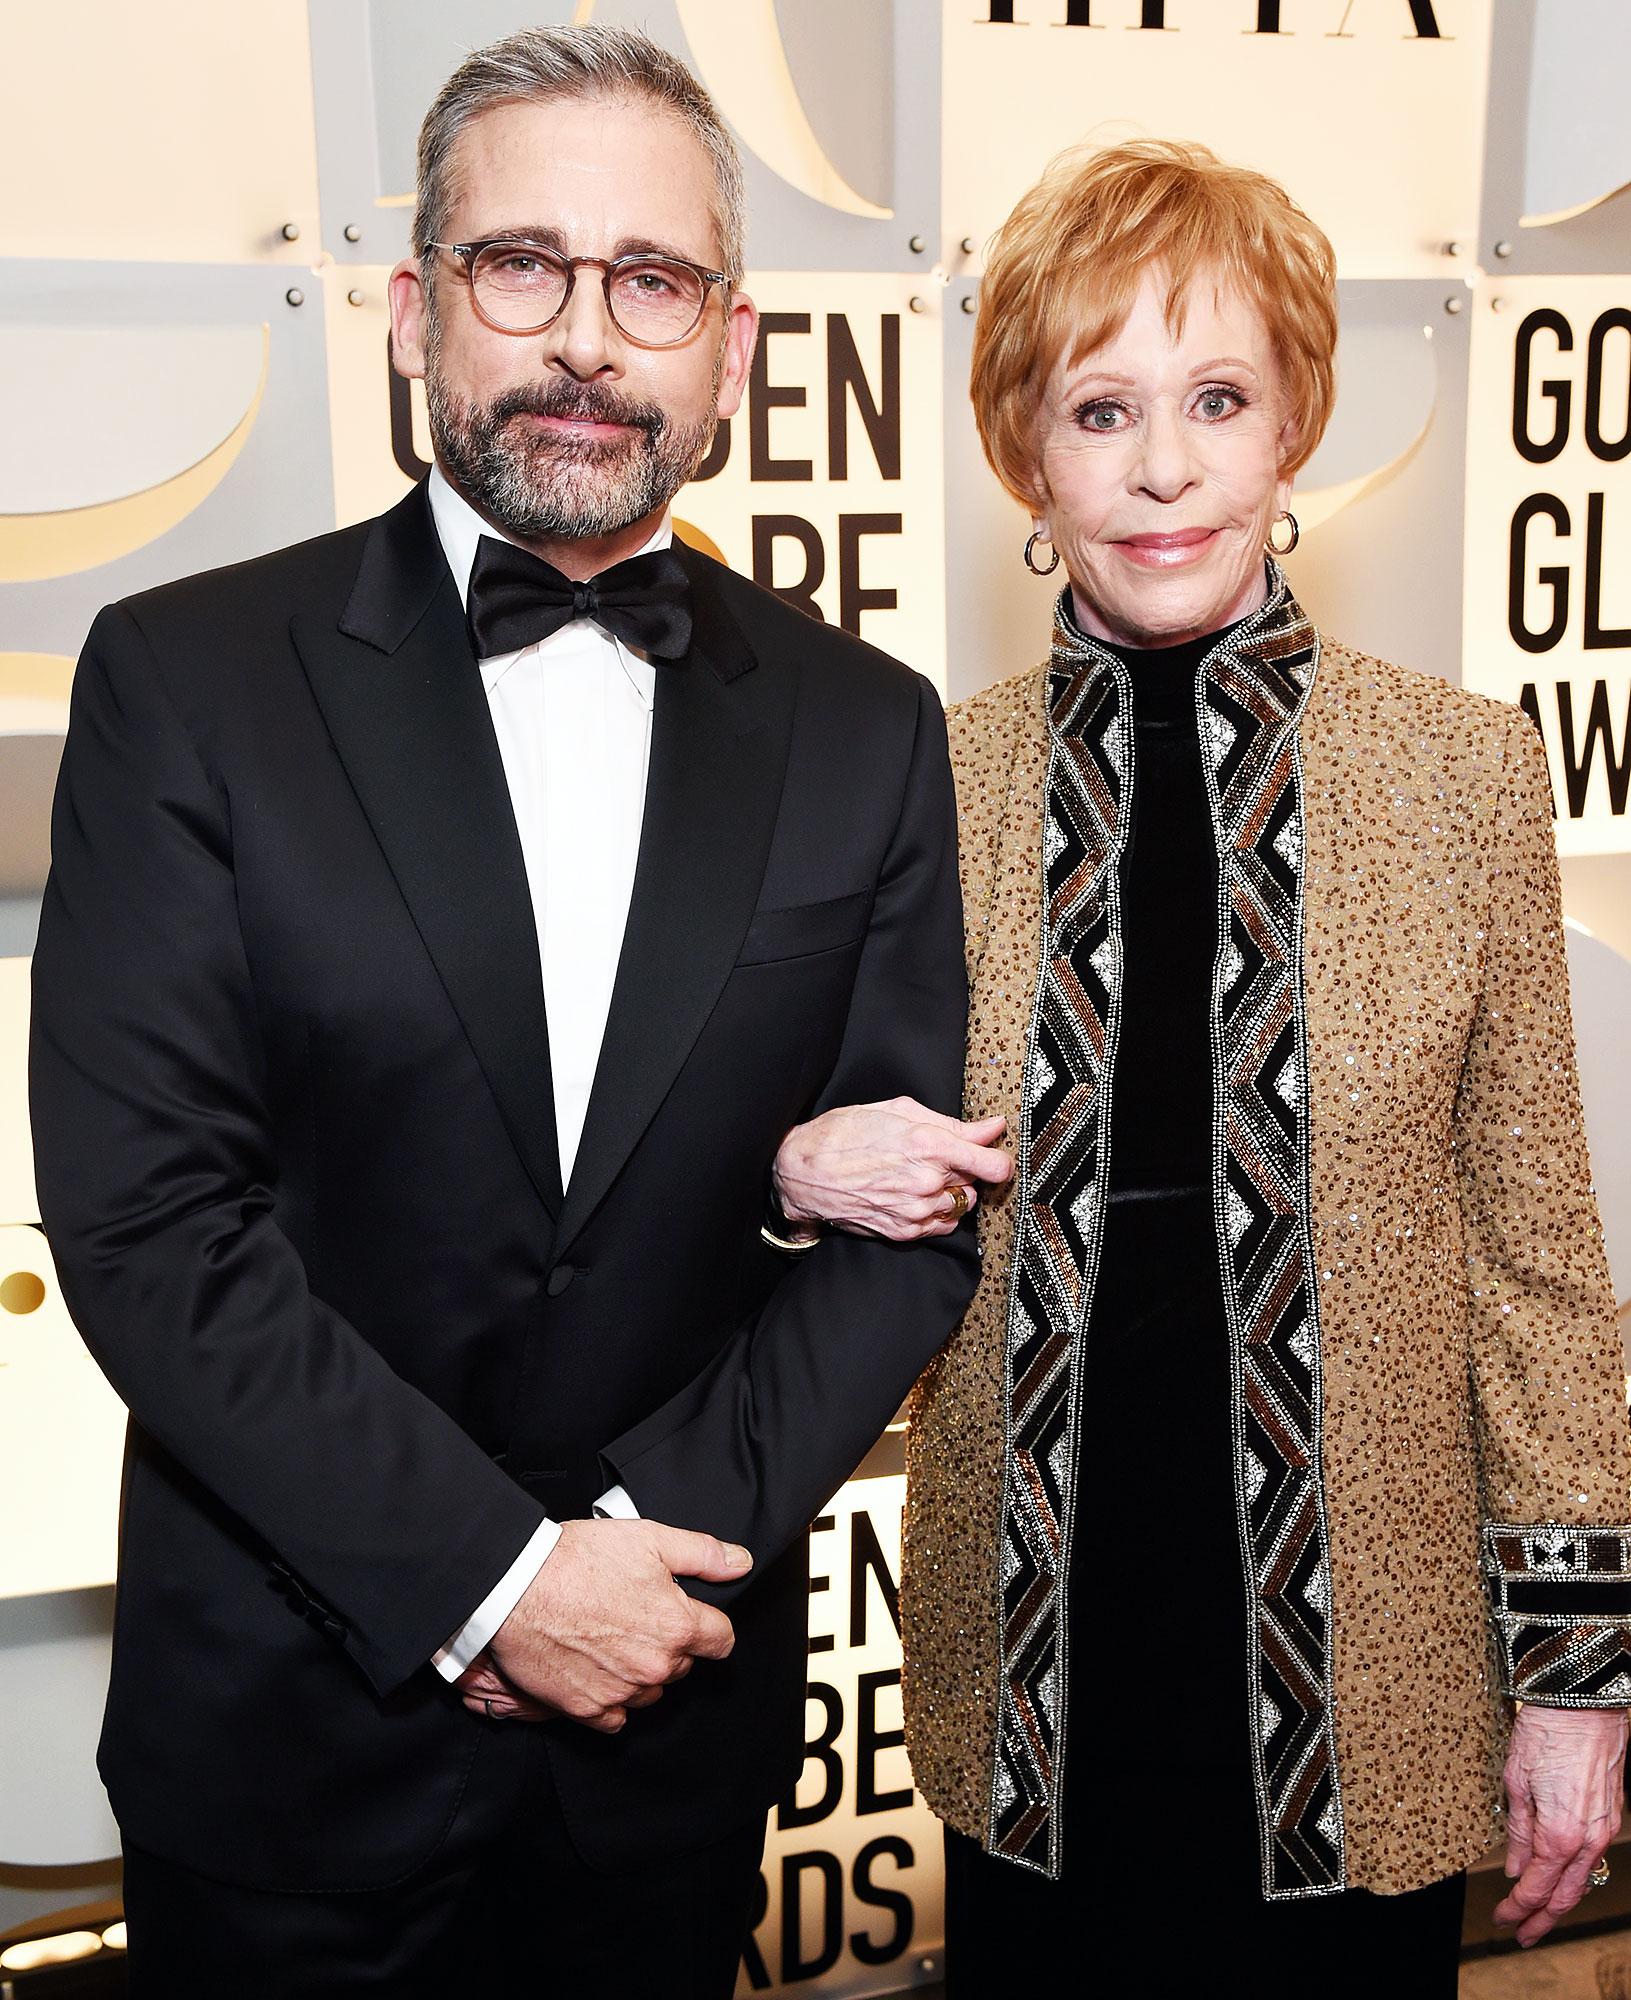 Inside Golden Globes 2019 Steve Carell Carol Burnett - Steve Carell linked arms with Carol Burnett backstage after presenting her with the inaugural Carol Burnett Award for lifetime achievement.